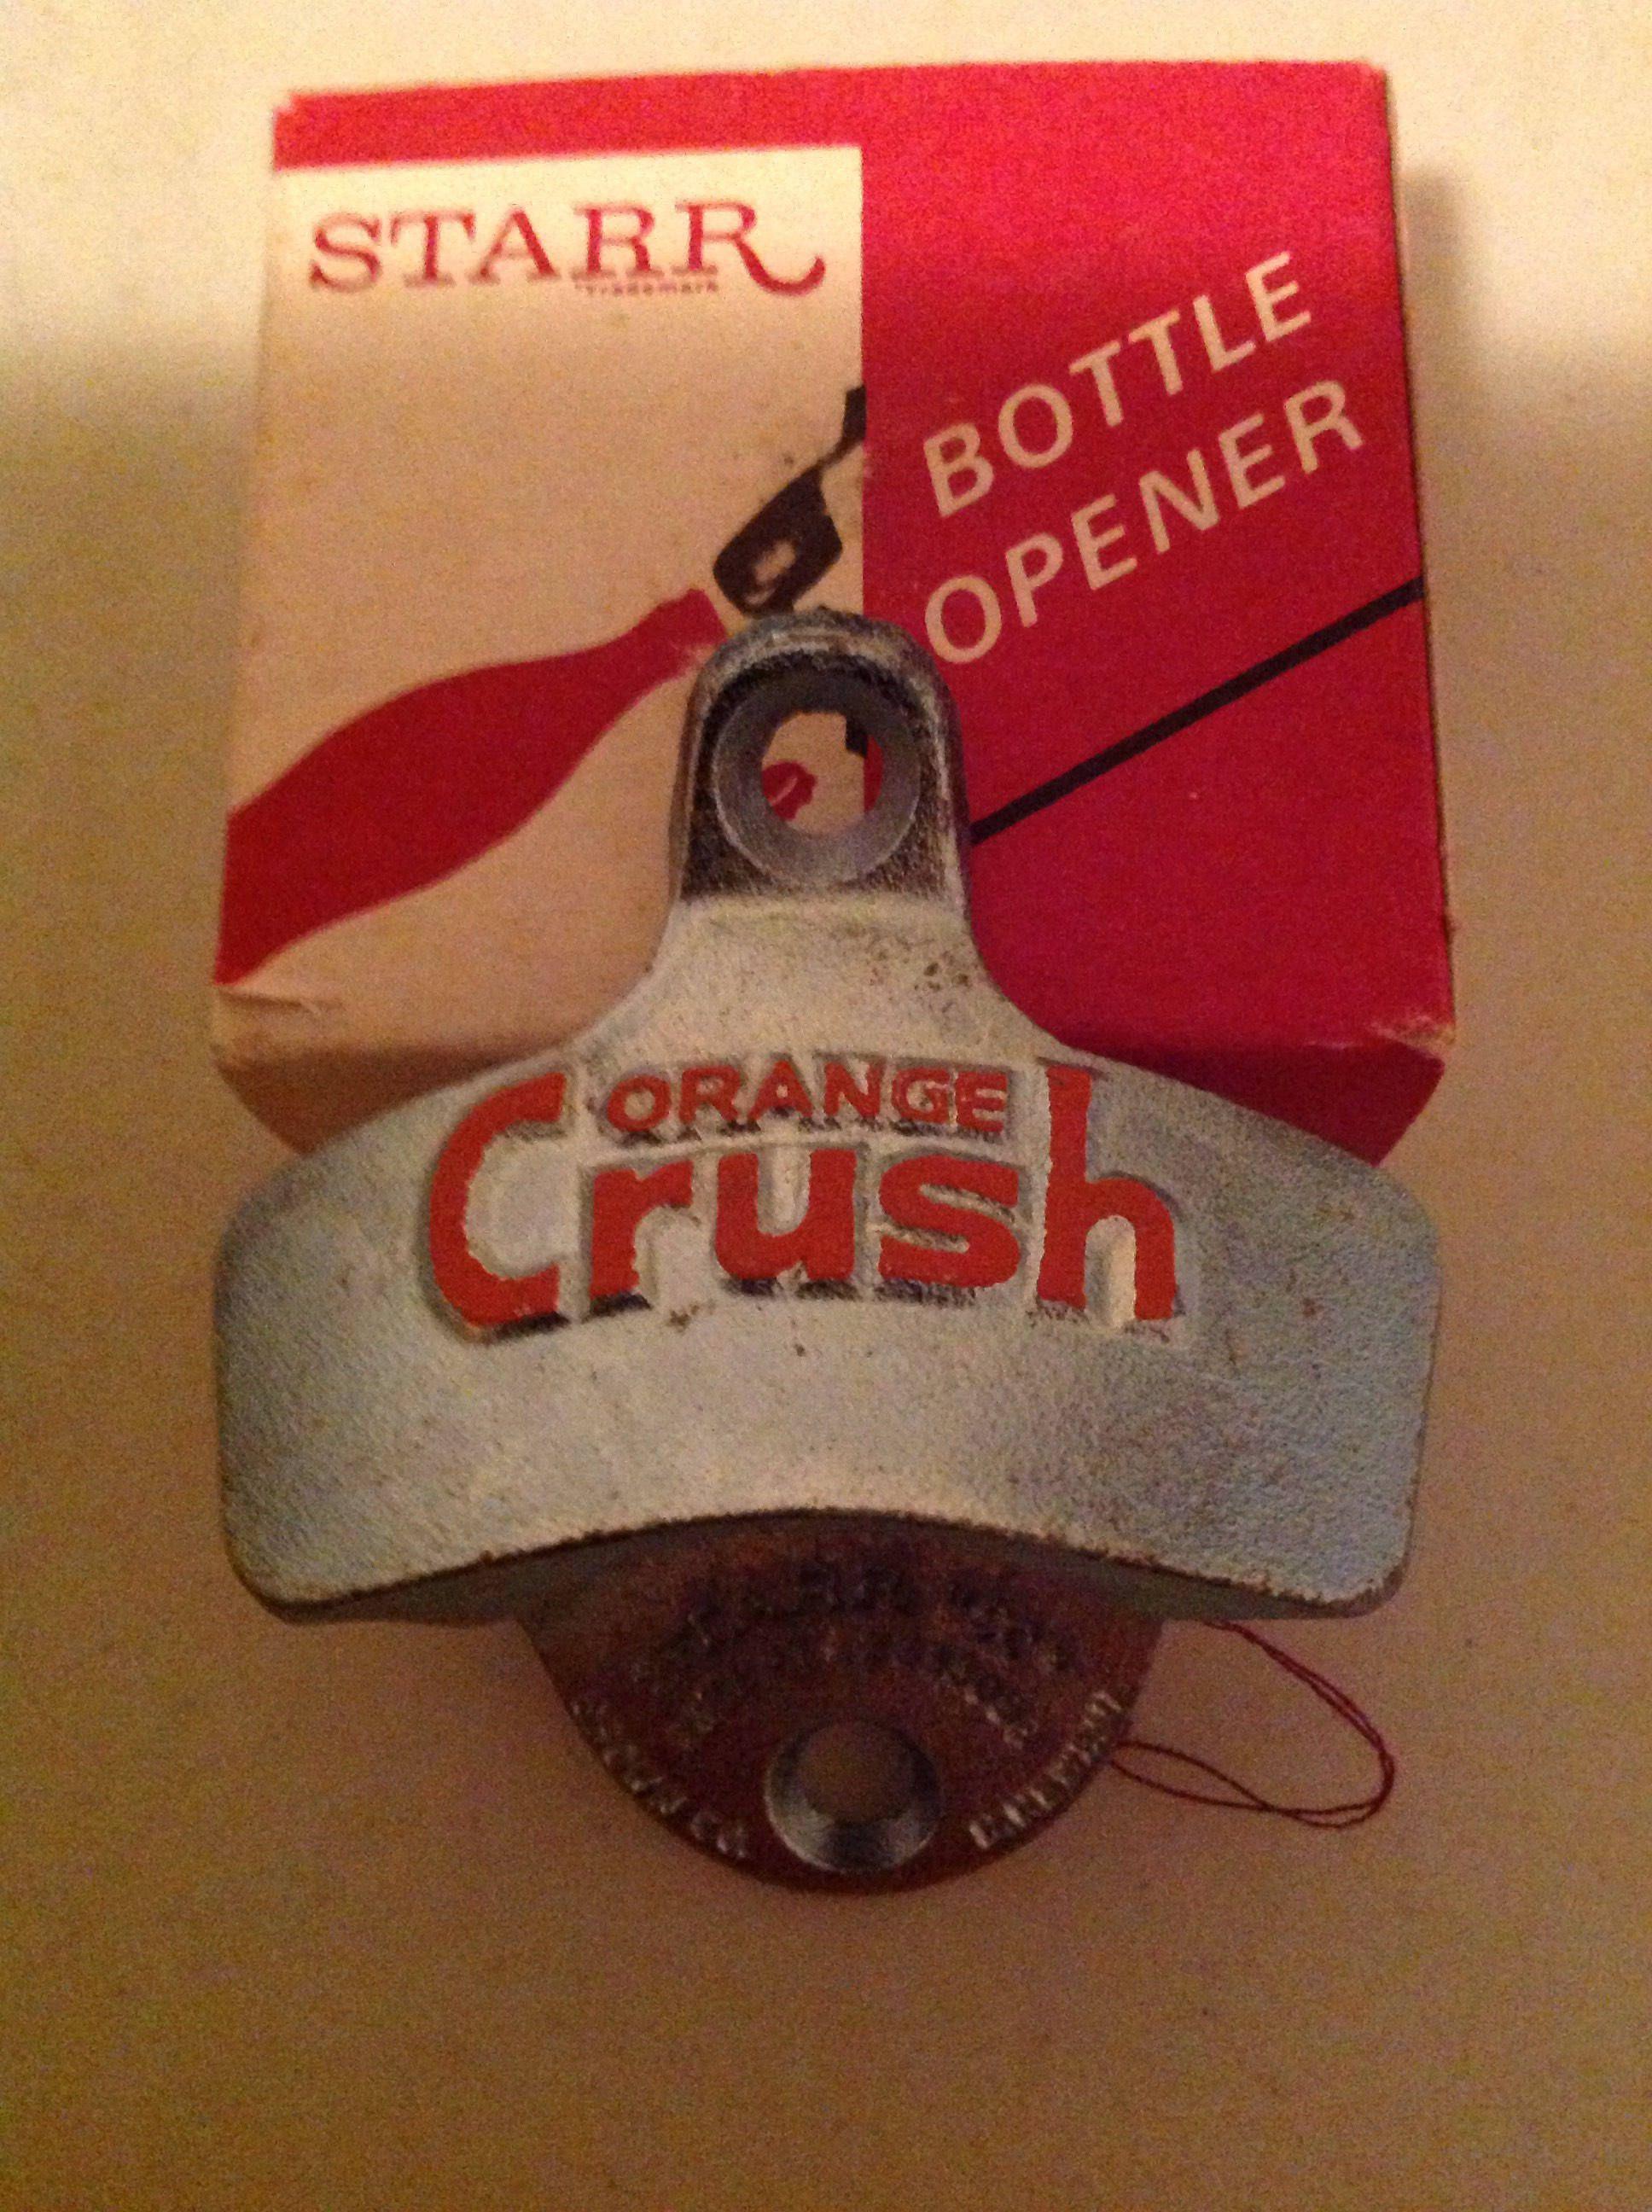 Vintage Orange Crush Soda Wall Mount Bottle Opener Starr X In Box Nos By Hutchhouseofvintage On Etsy Orange Crush Soda Soda Bottle Opener Orange Crush